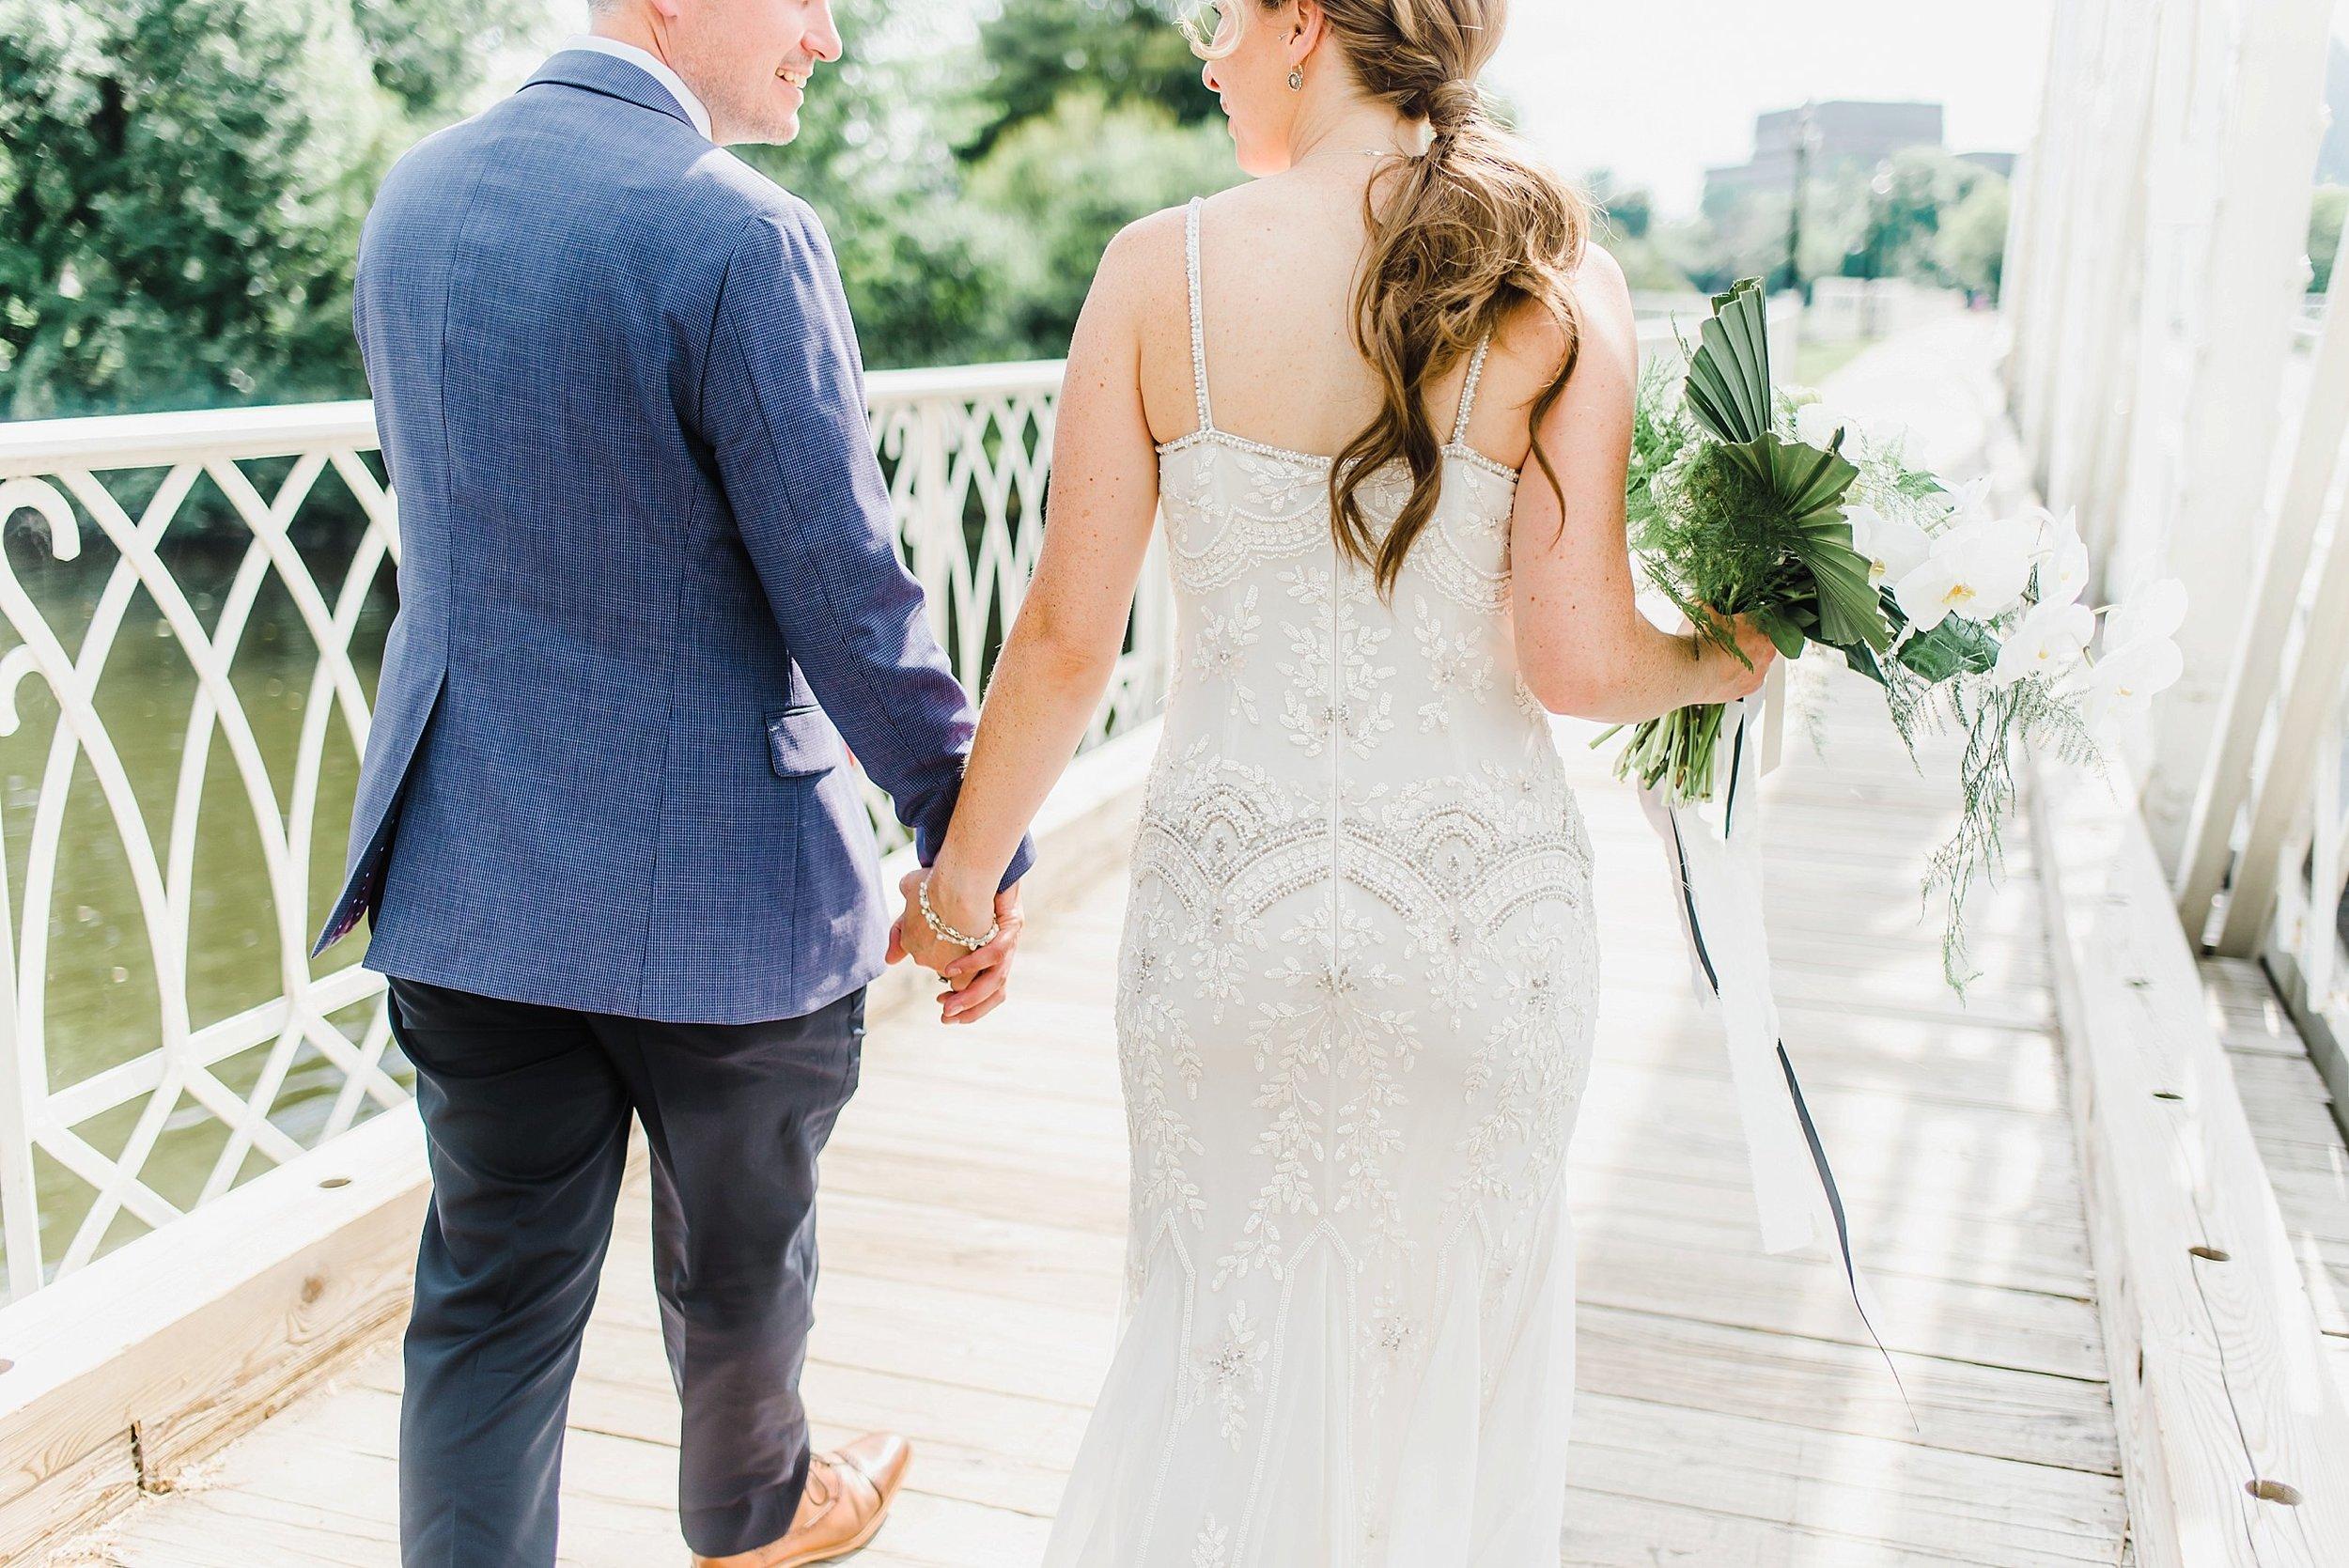 light airy indie fine art ottawa wedding photographer | Ali and Batoul Photography_0653.jpg